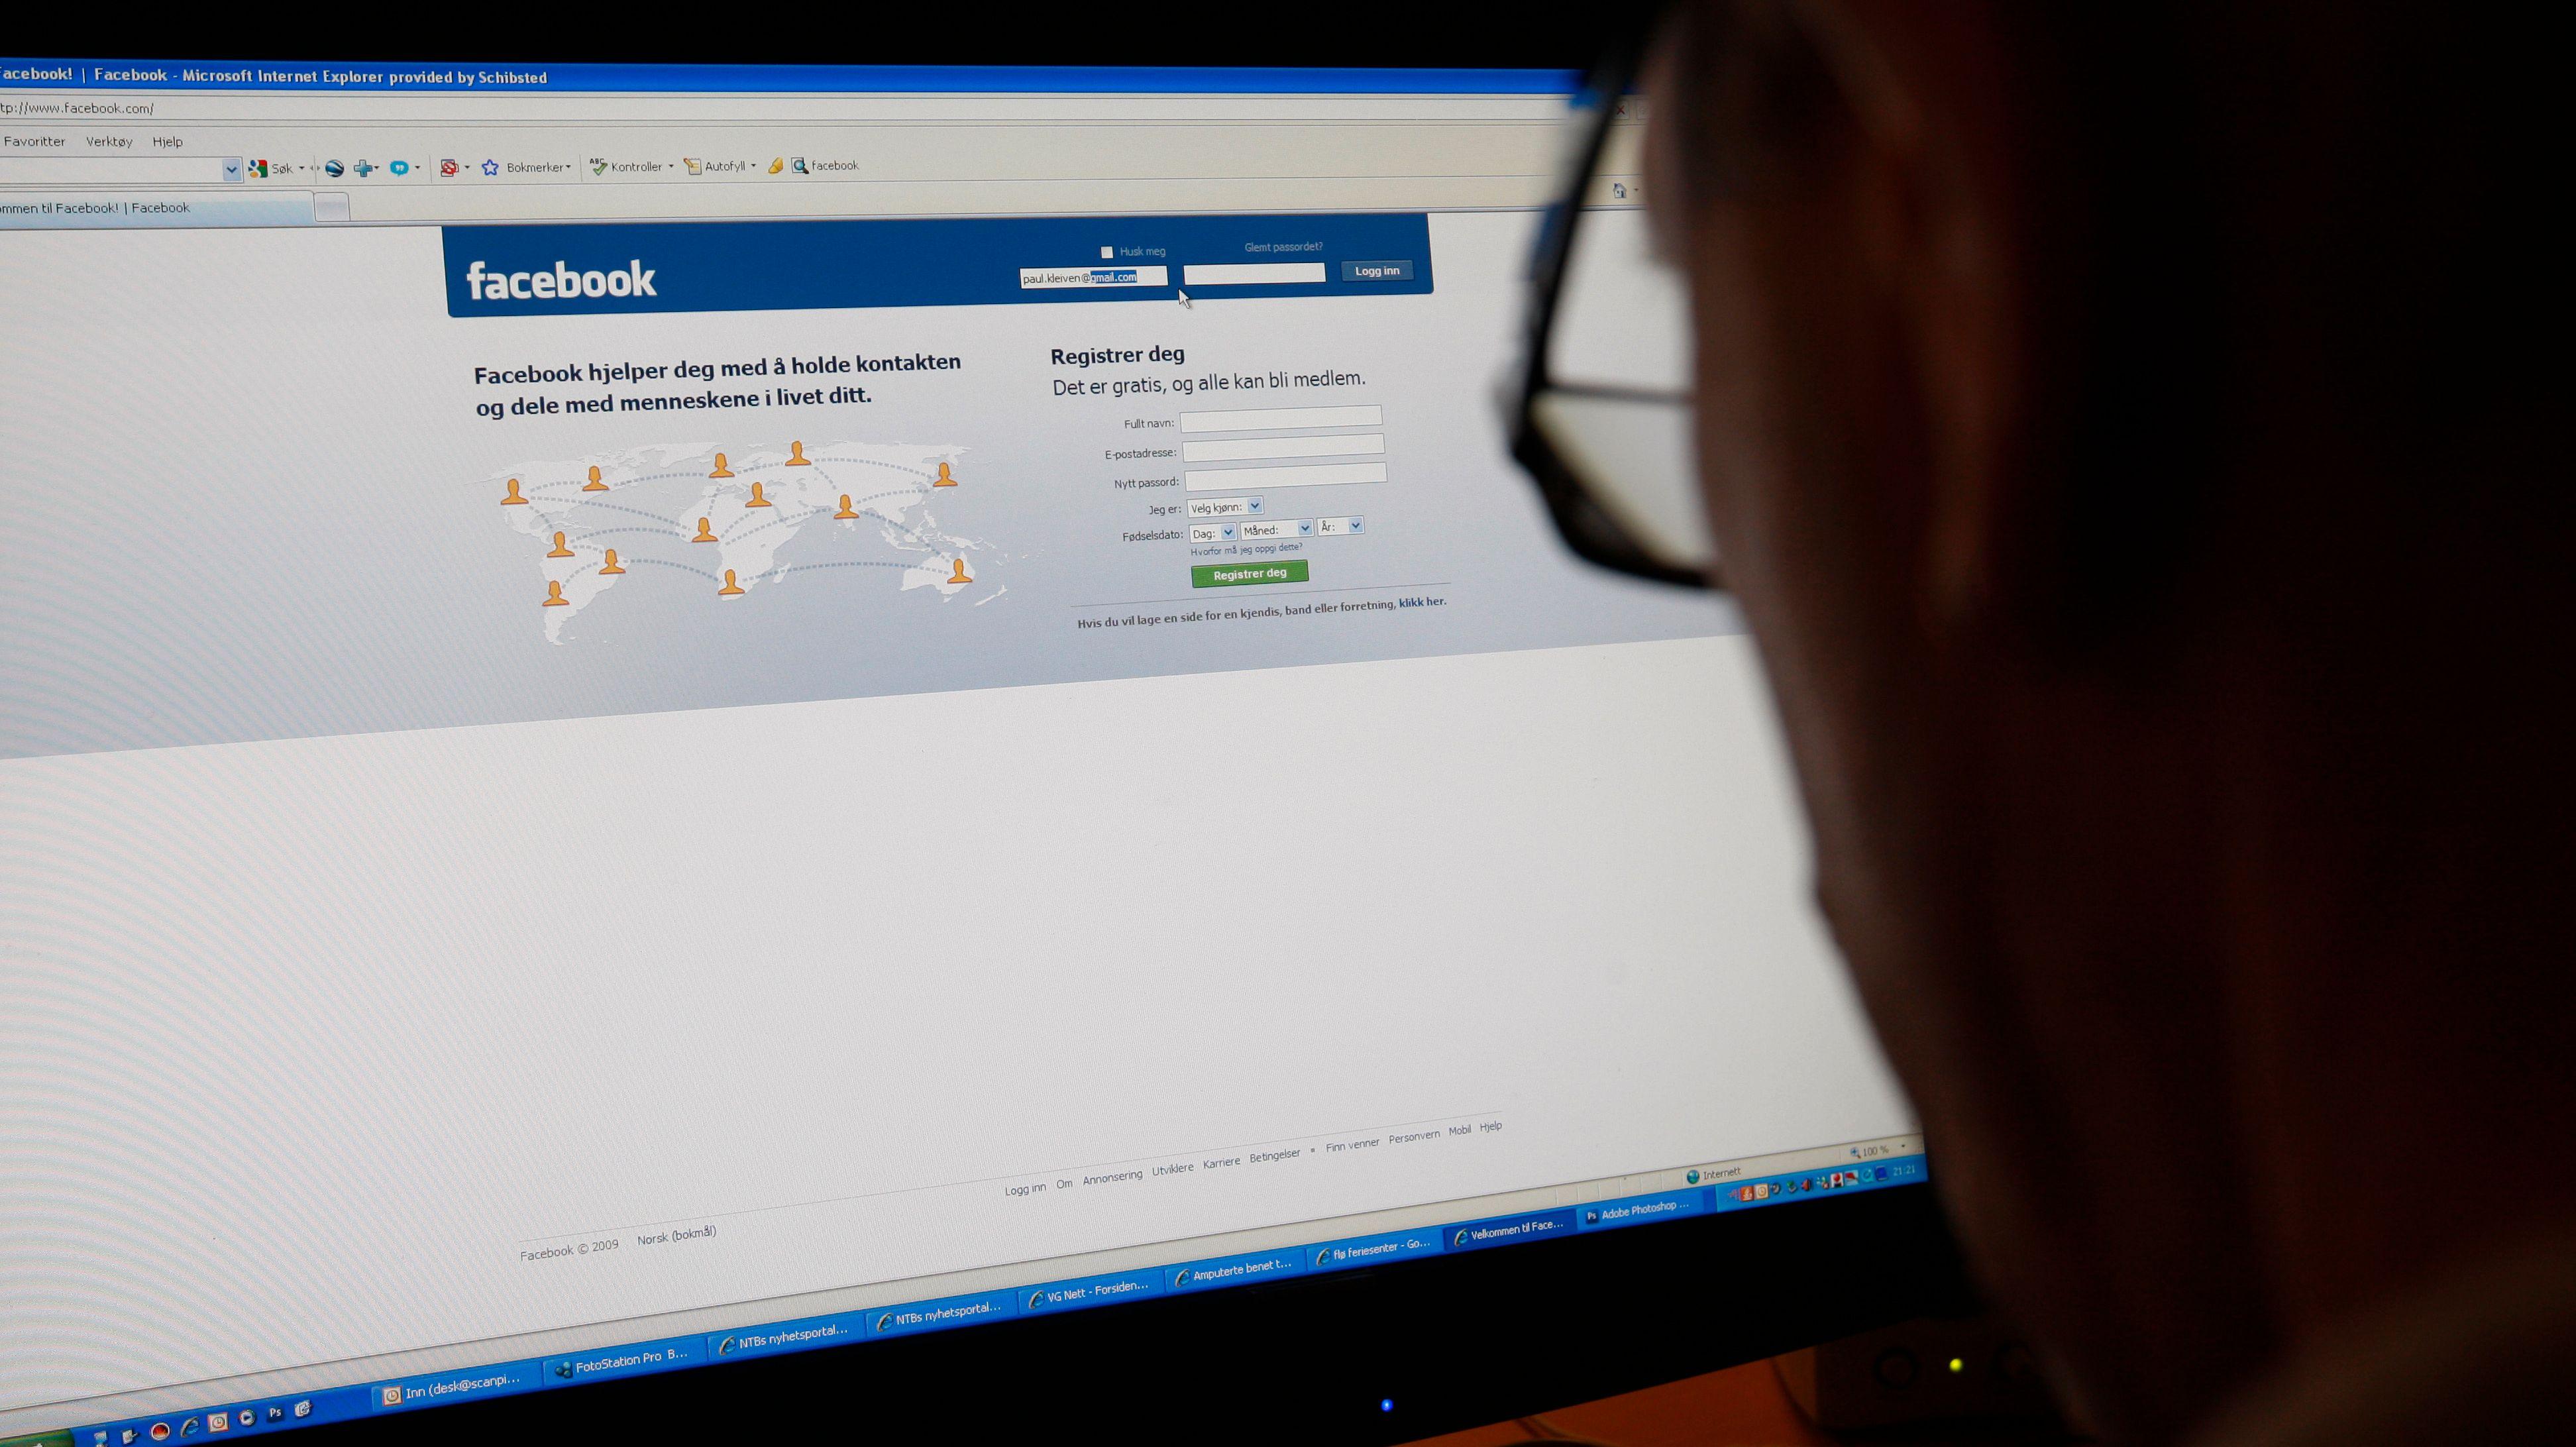 50 millioner Facebook-kontoer ble hacket – slik klarte de det